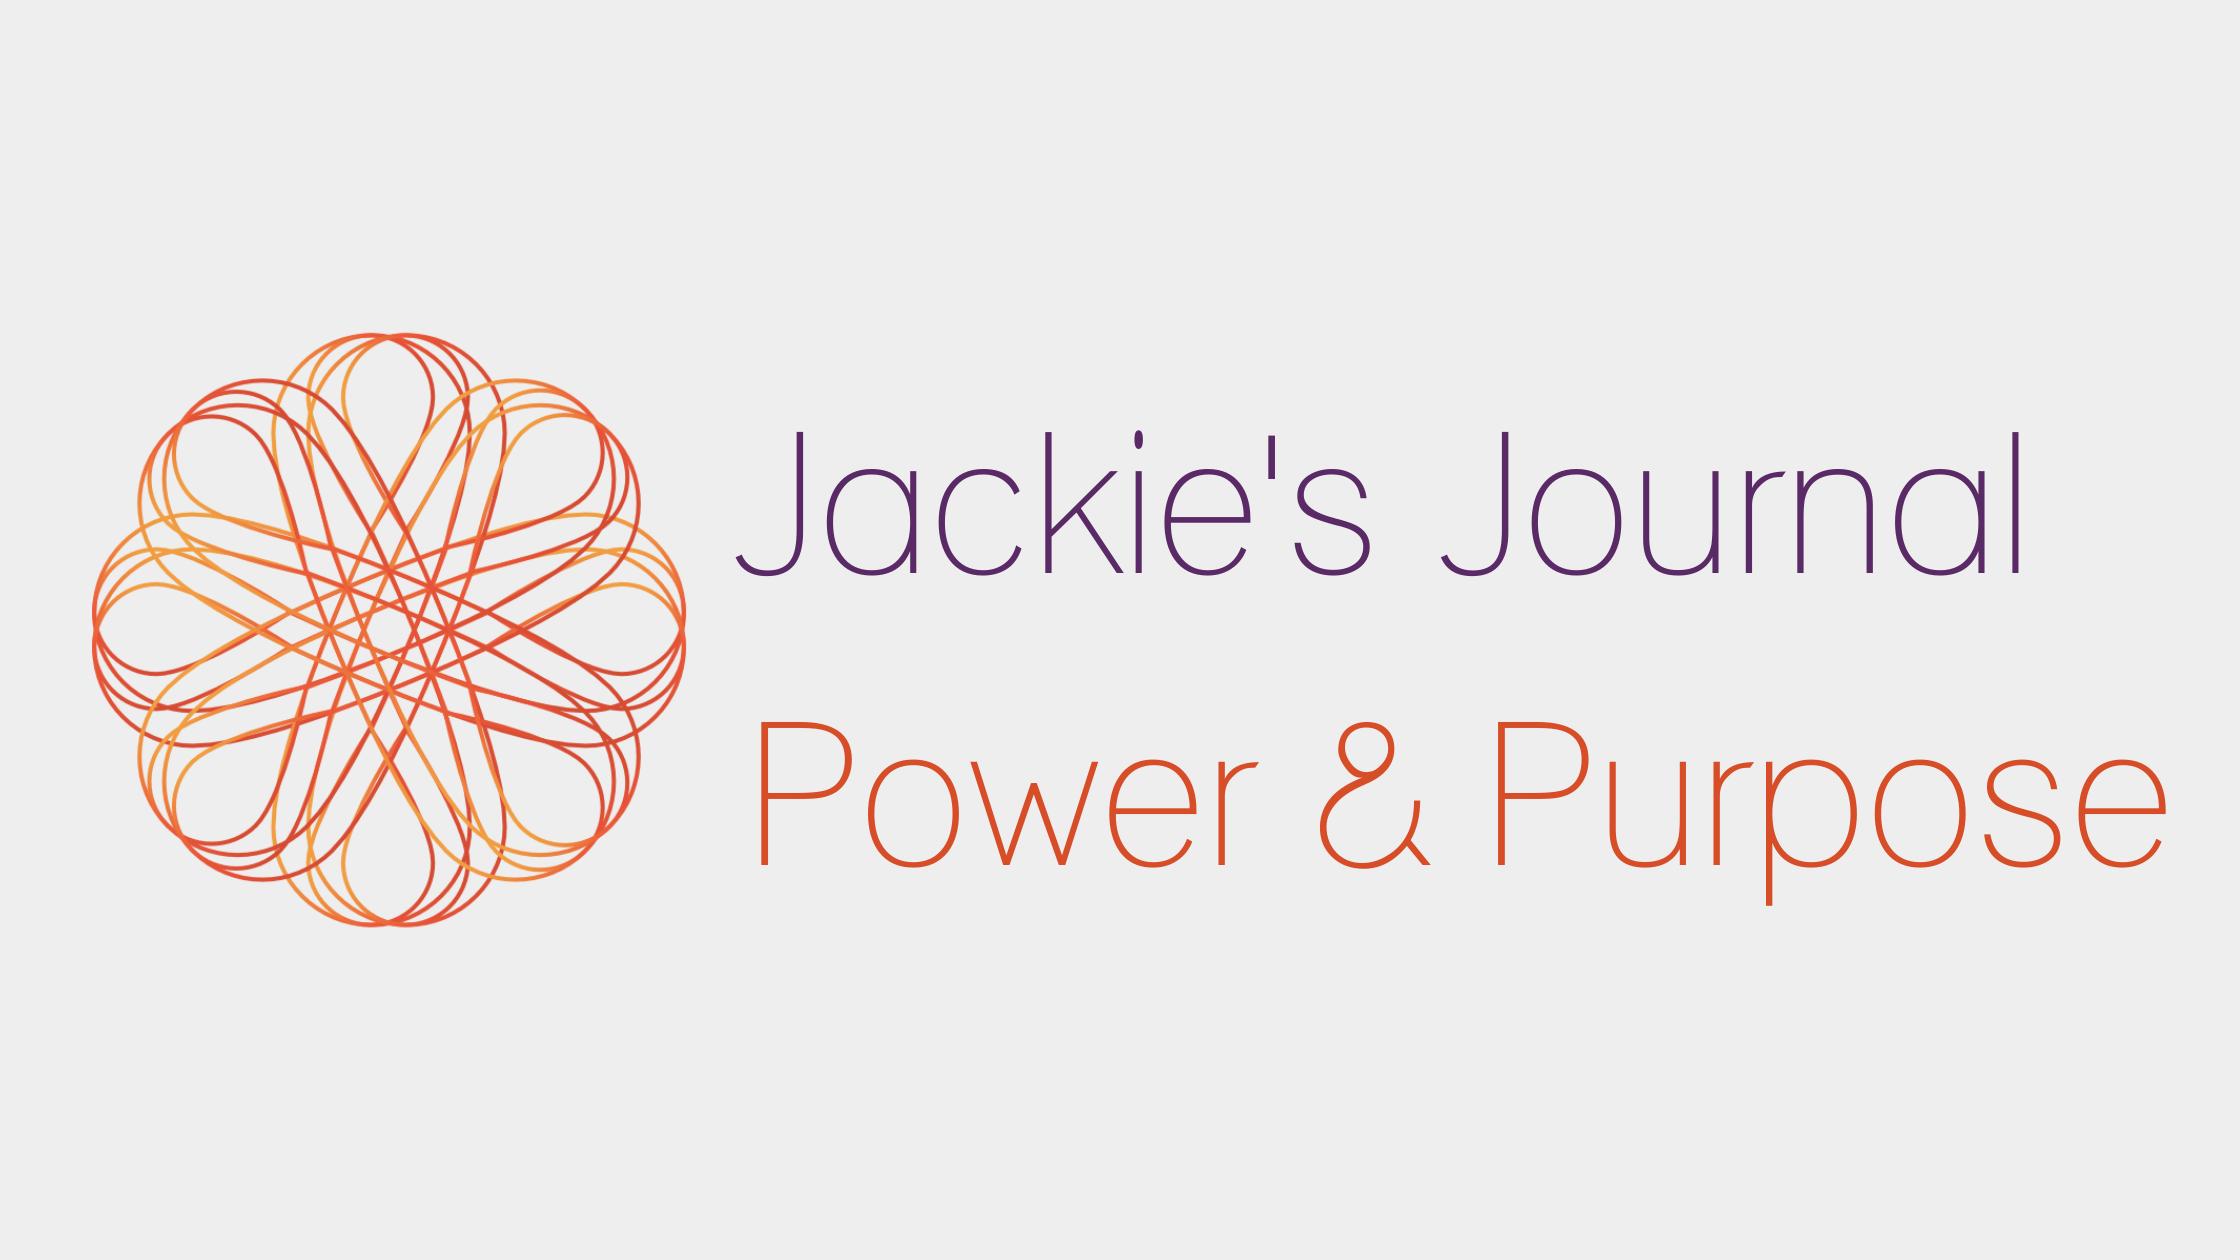 Jackie's journal, upgrading my purpose and unlocking my power